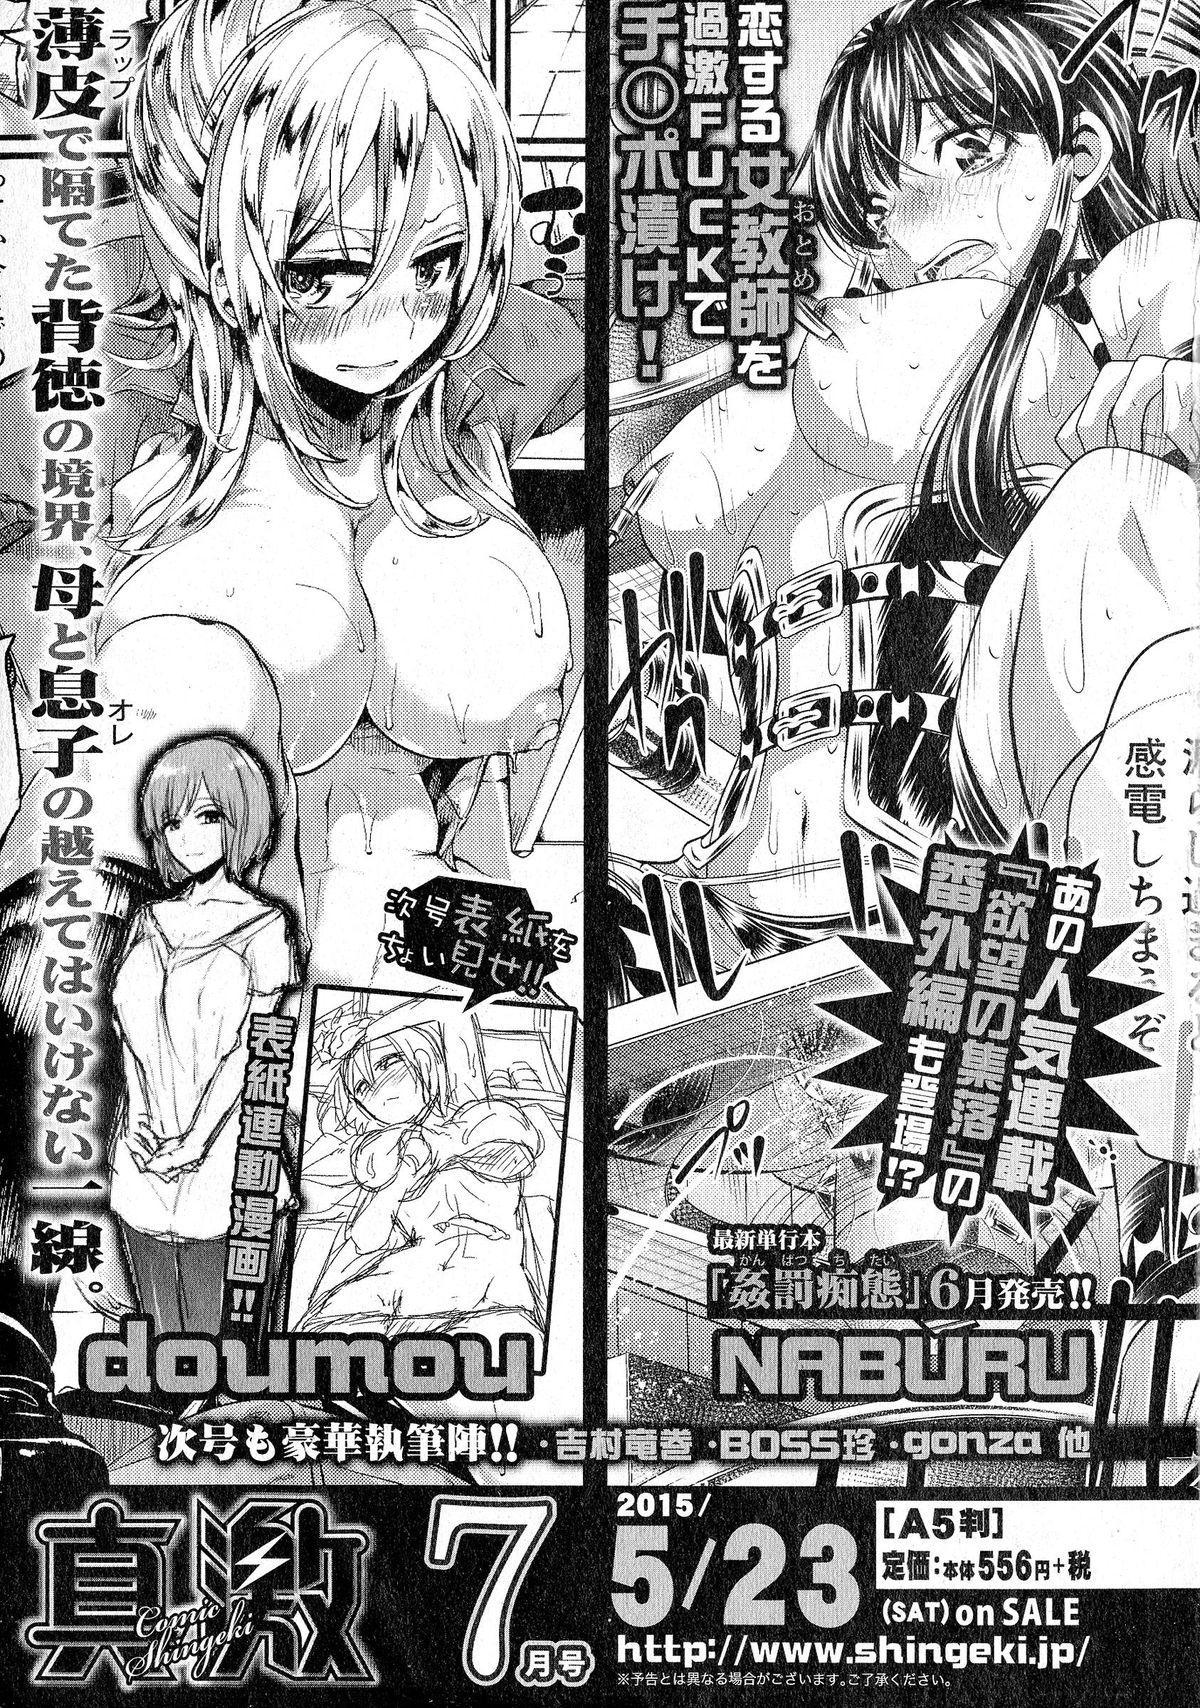 Comic Shingeki 2015-06 371